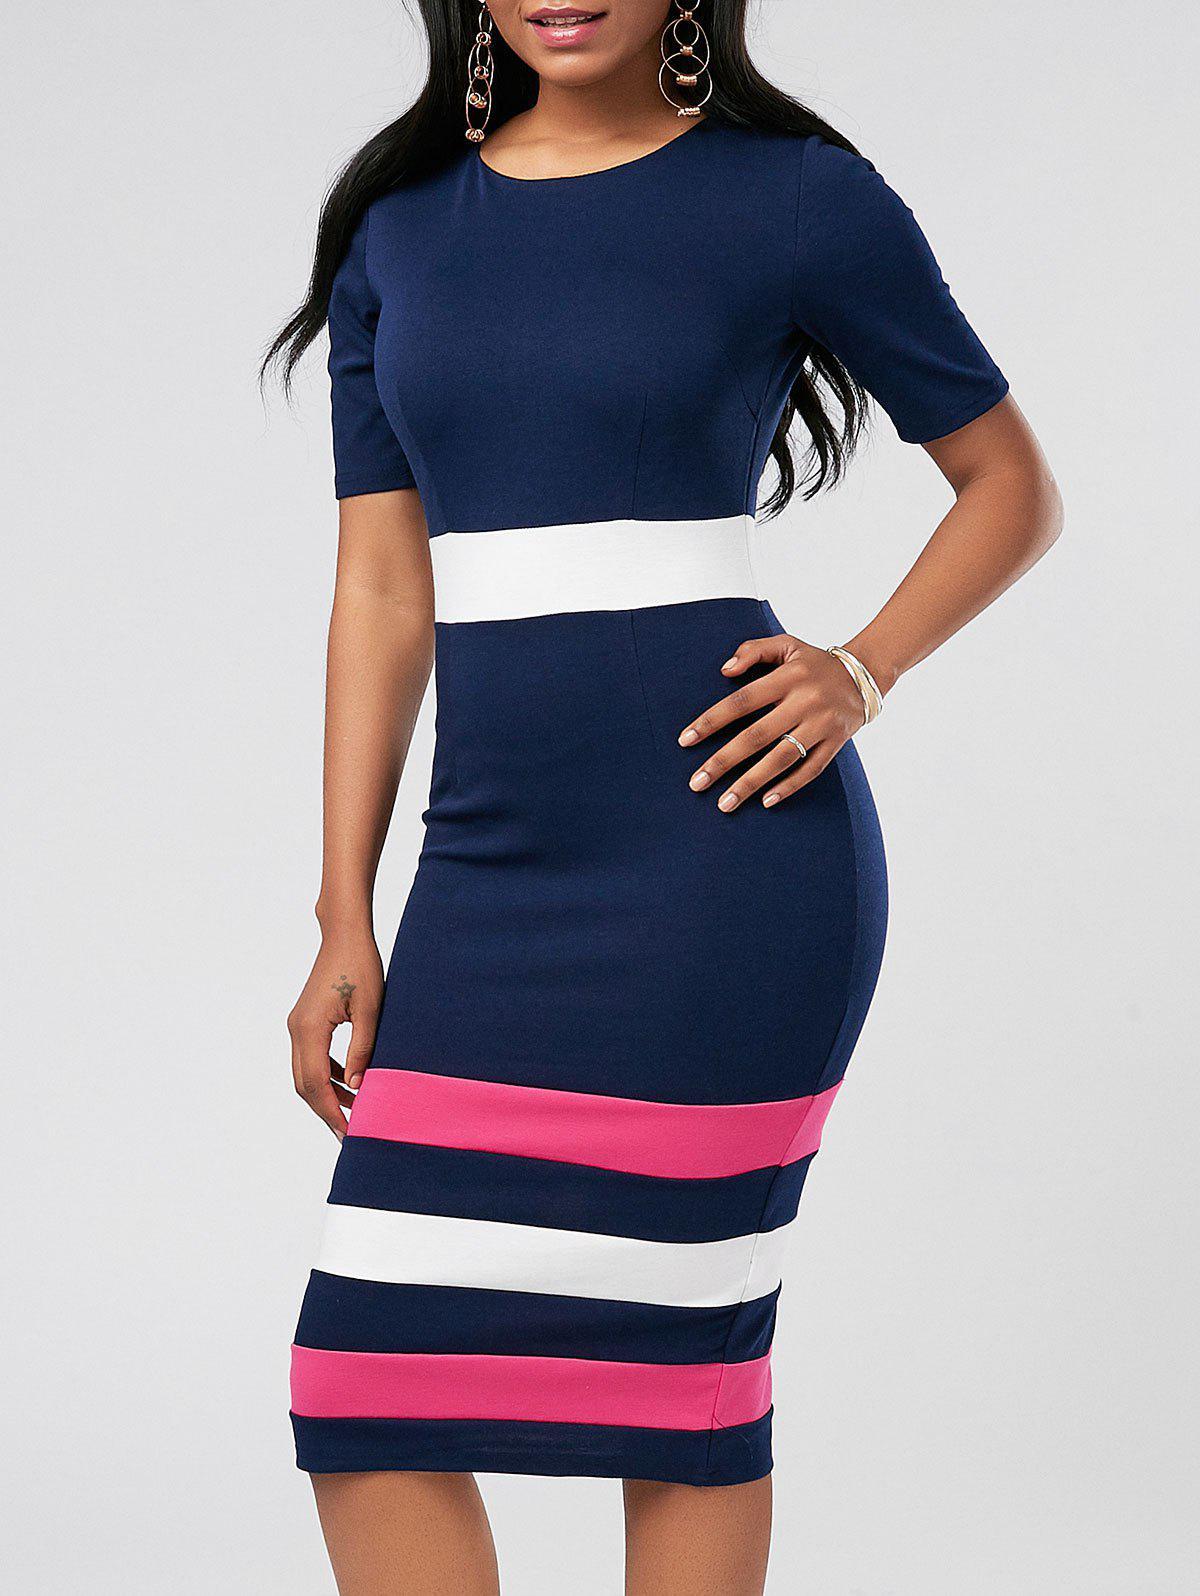 Color Block Midi Sheath Pencil Dress 215708203